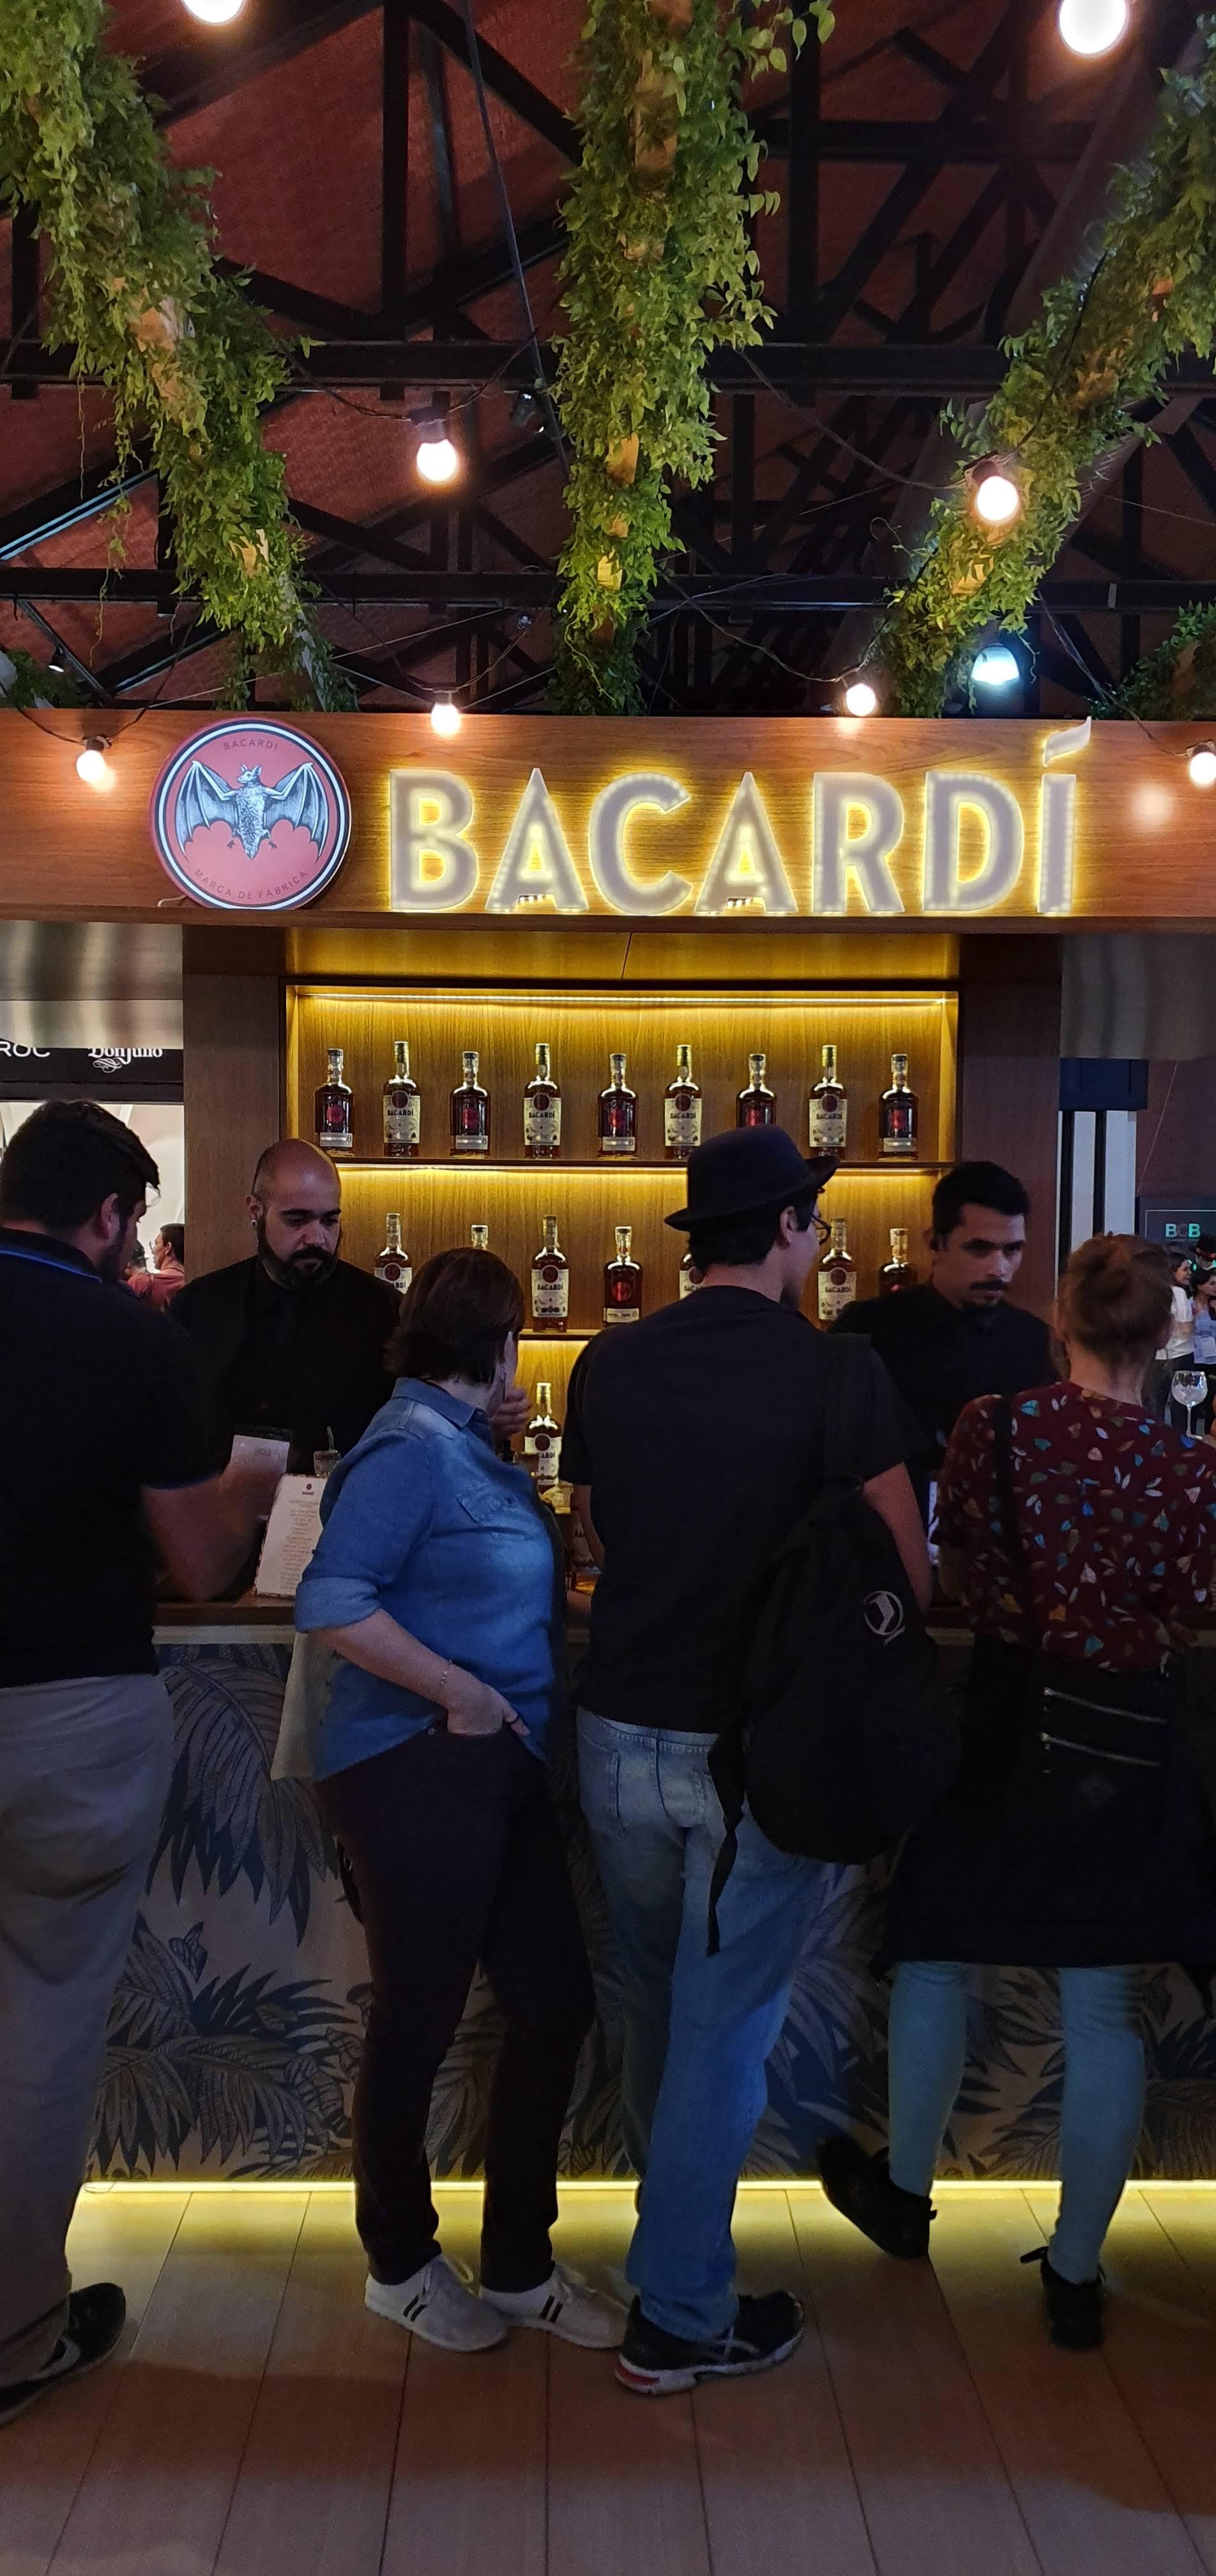 Bar Convent São Paulo 2019 - Bacardi